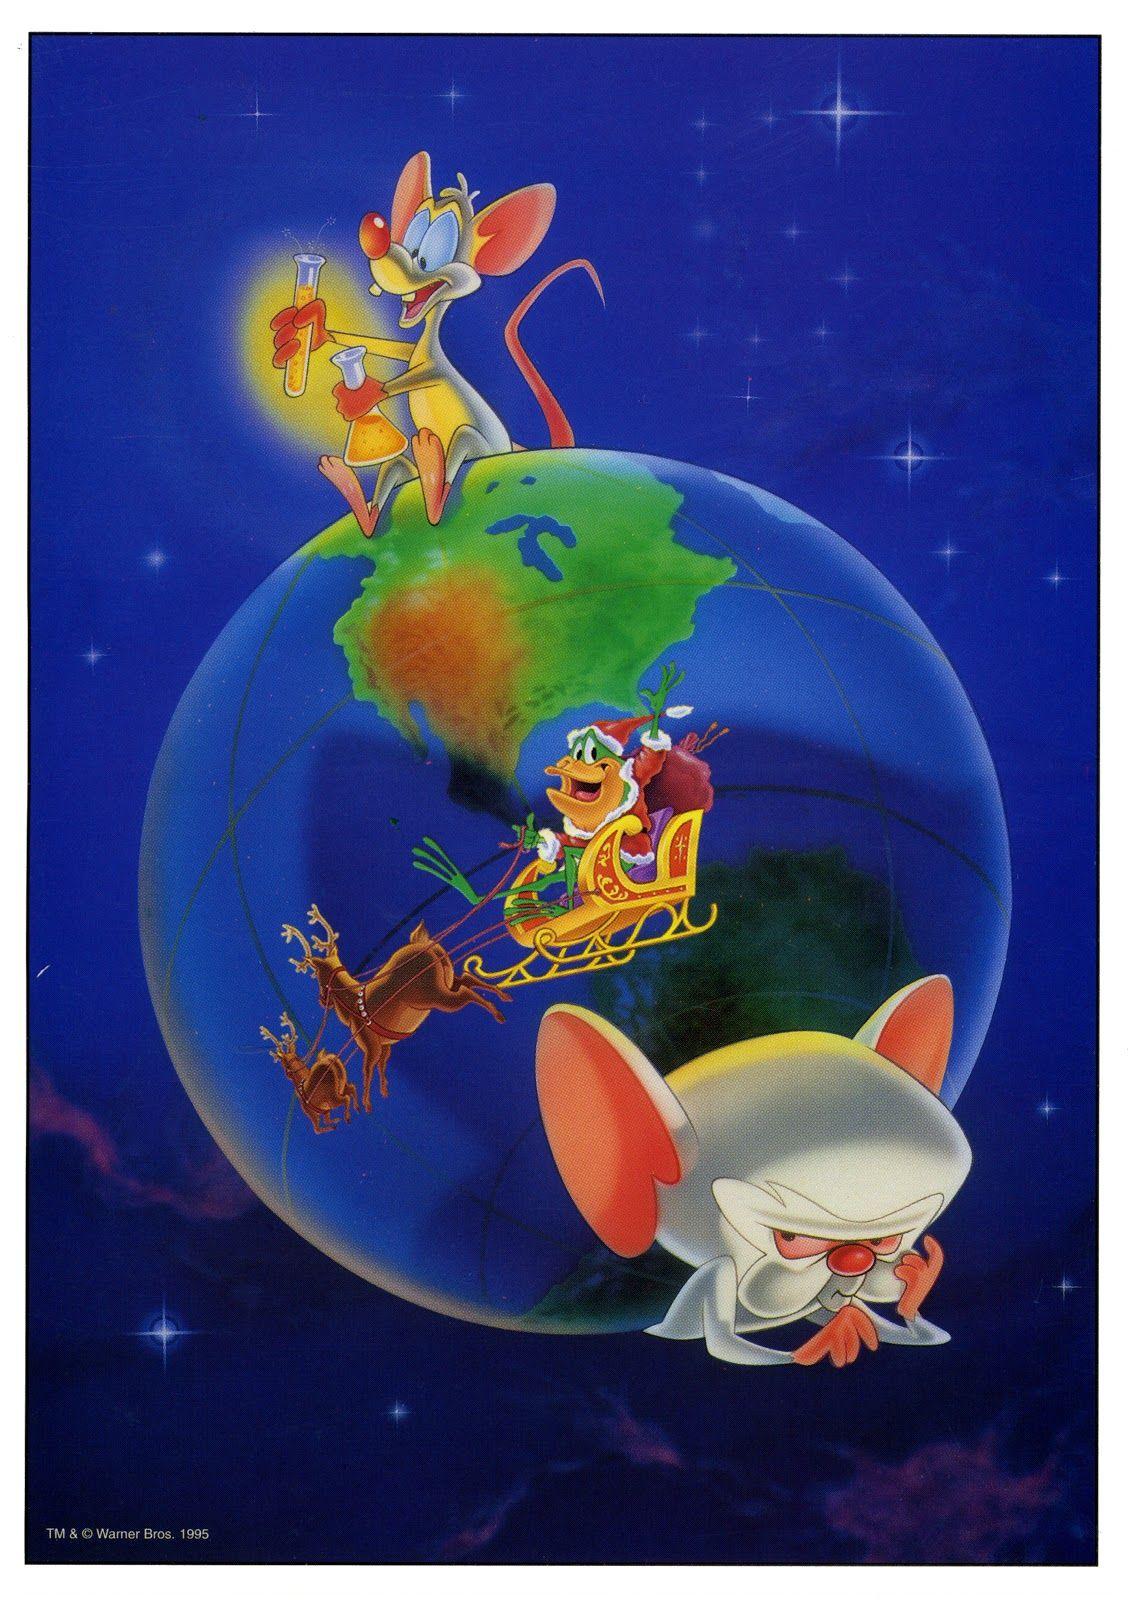 Pinky And The Brain Christmas.Cartoonatics Pinky And The Brain Christmas Card Pinky And